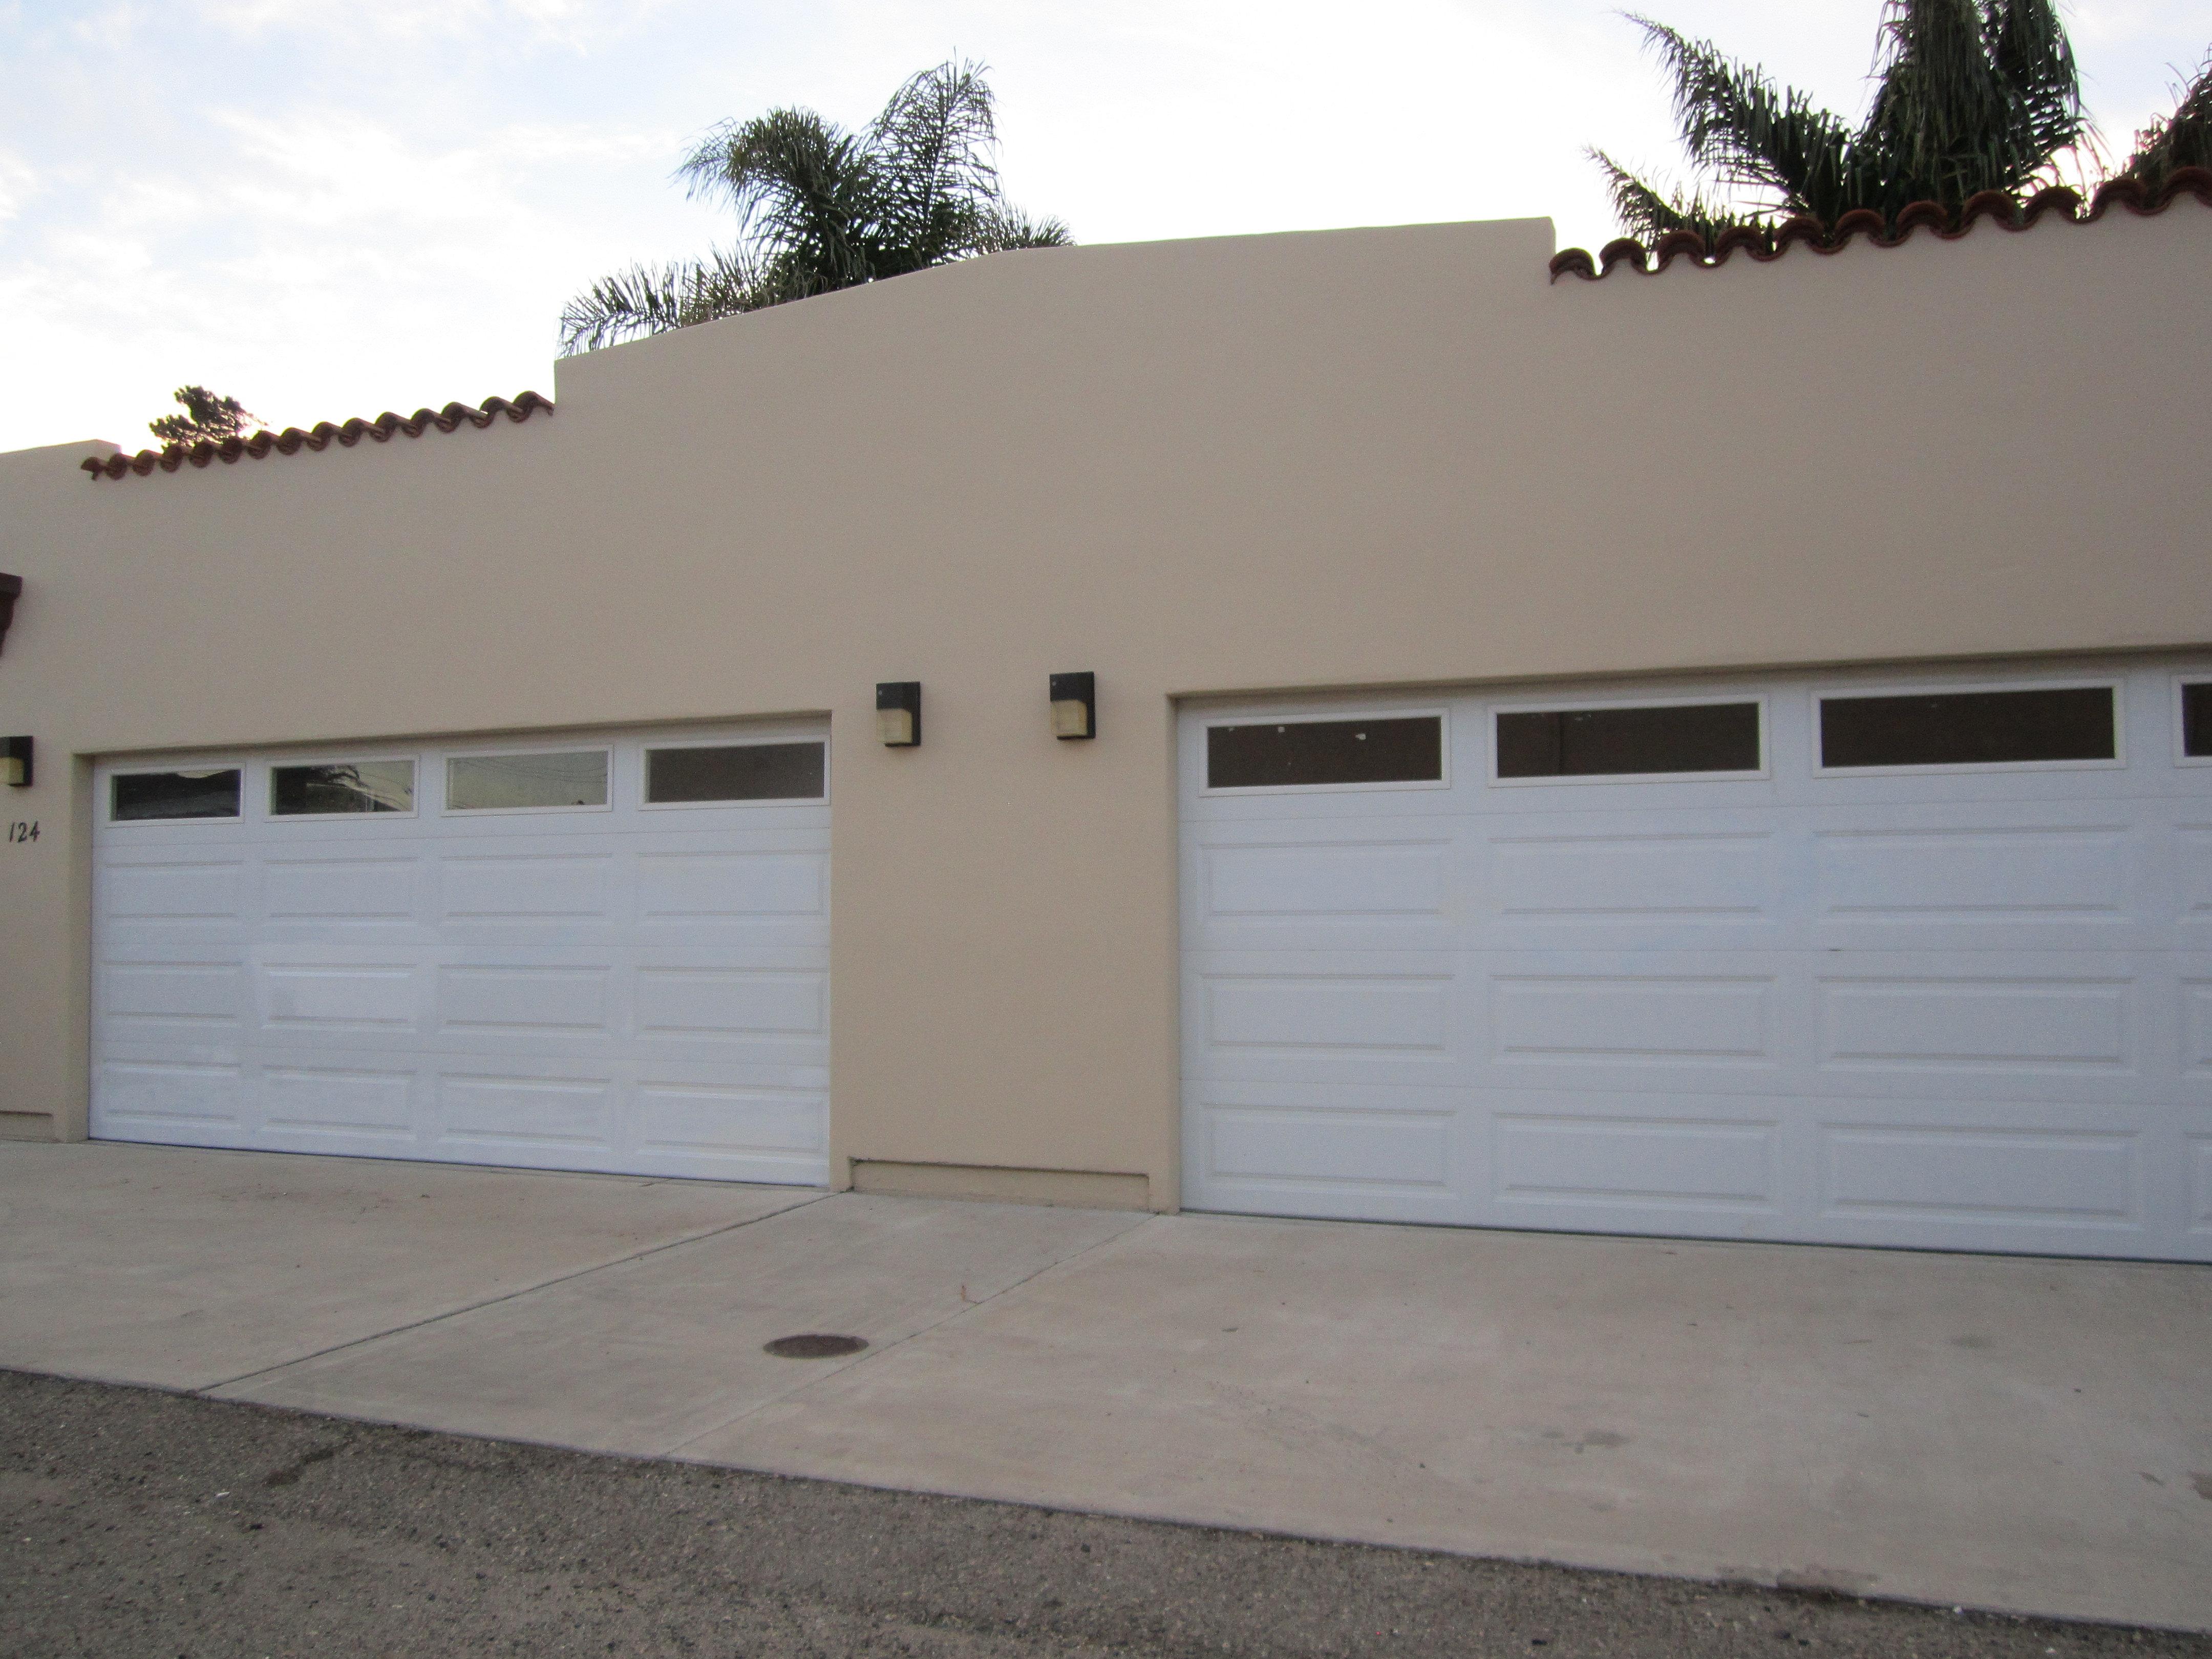 805 property management justin cochrane 2 car garage for Garage per 2 auto